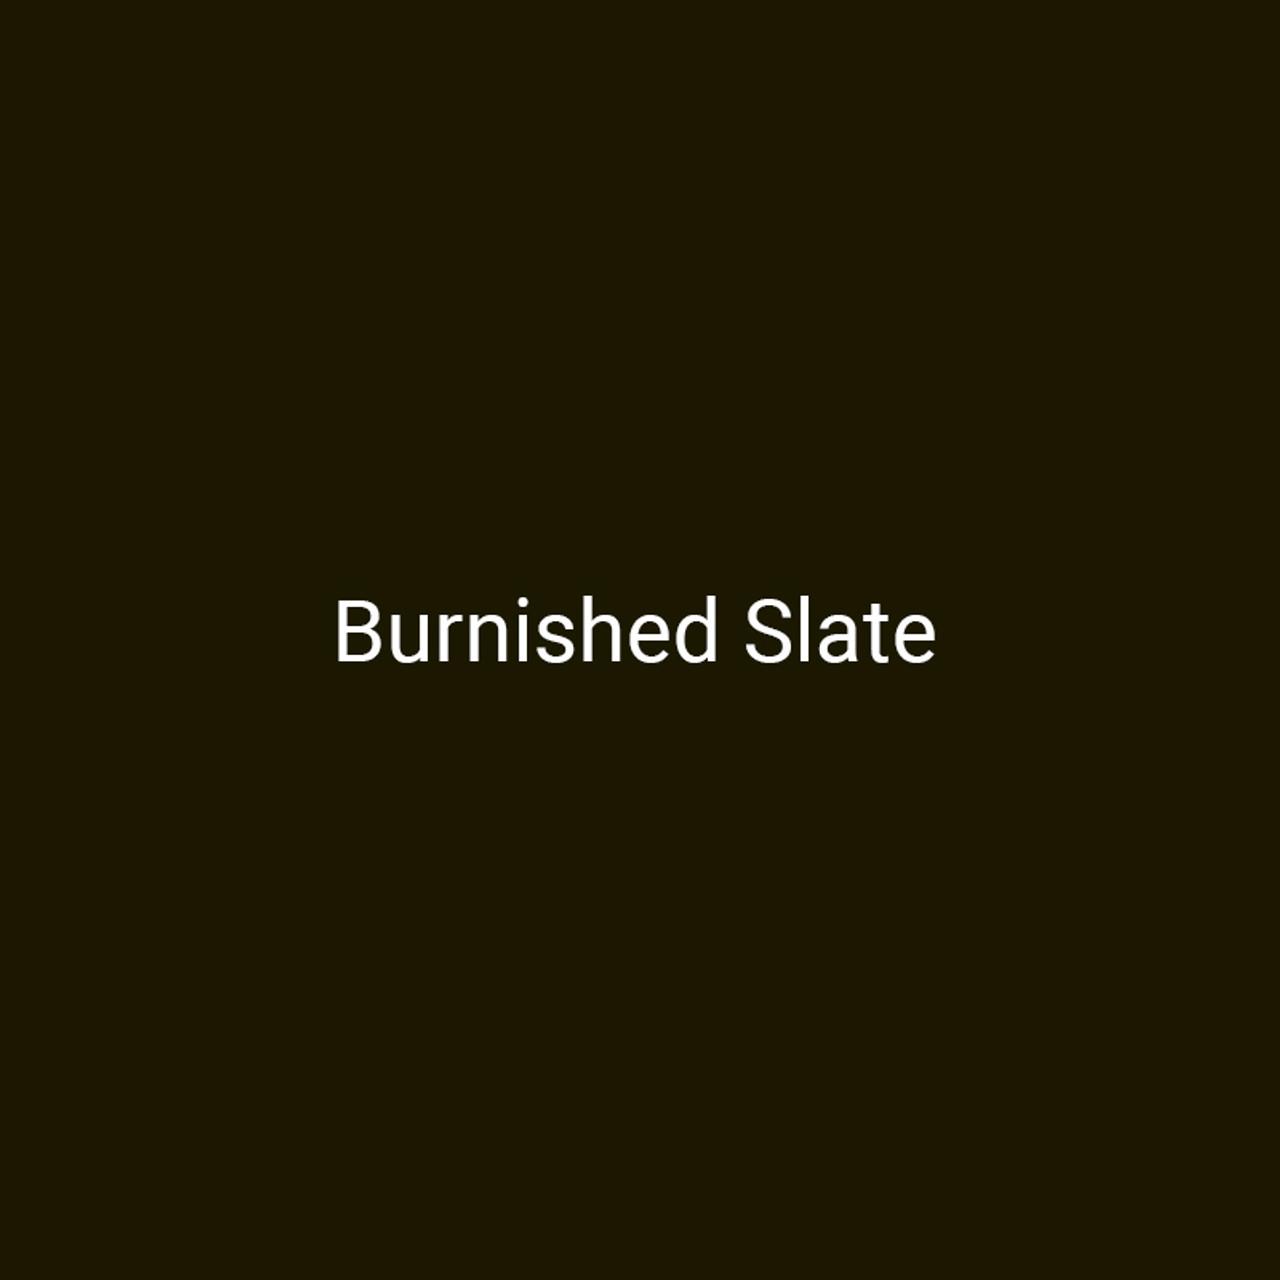 29ga Burnished Slate A Burnt Gray Metal Finish By Bridger Steel